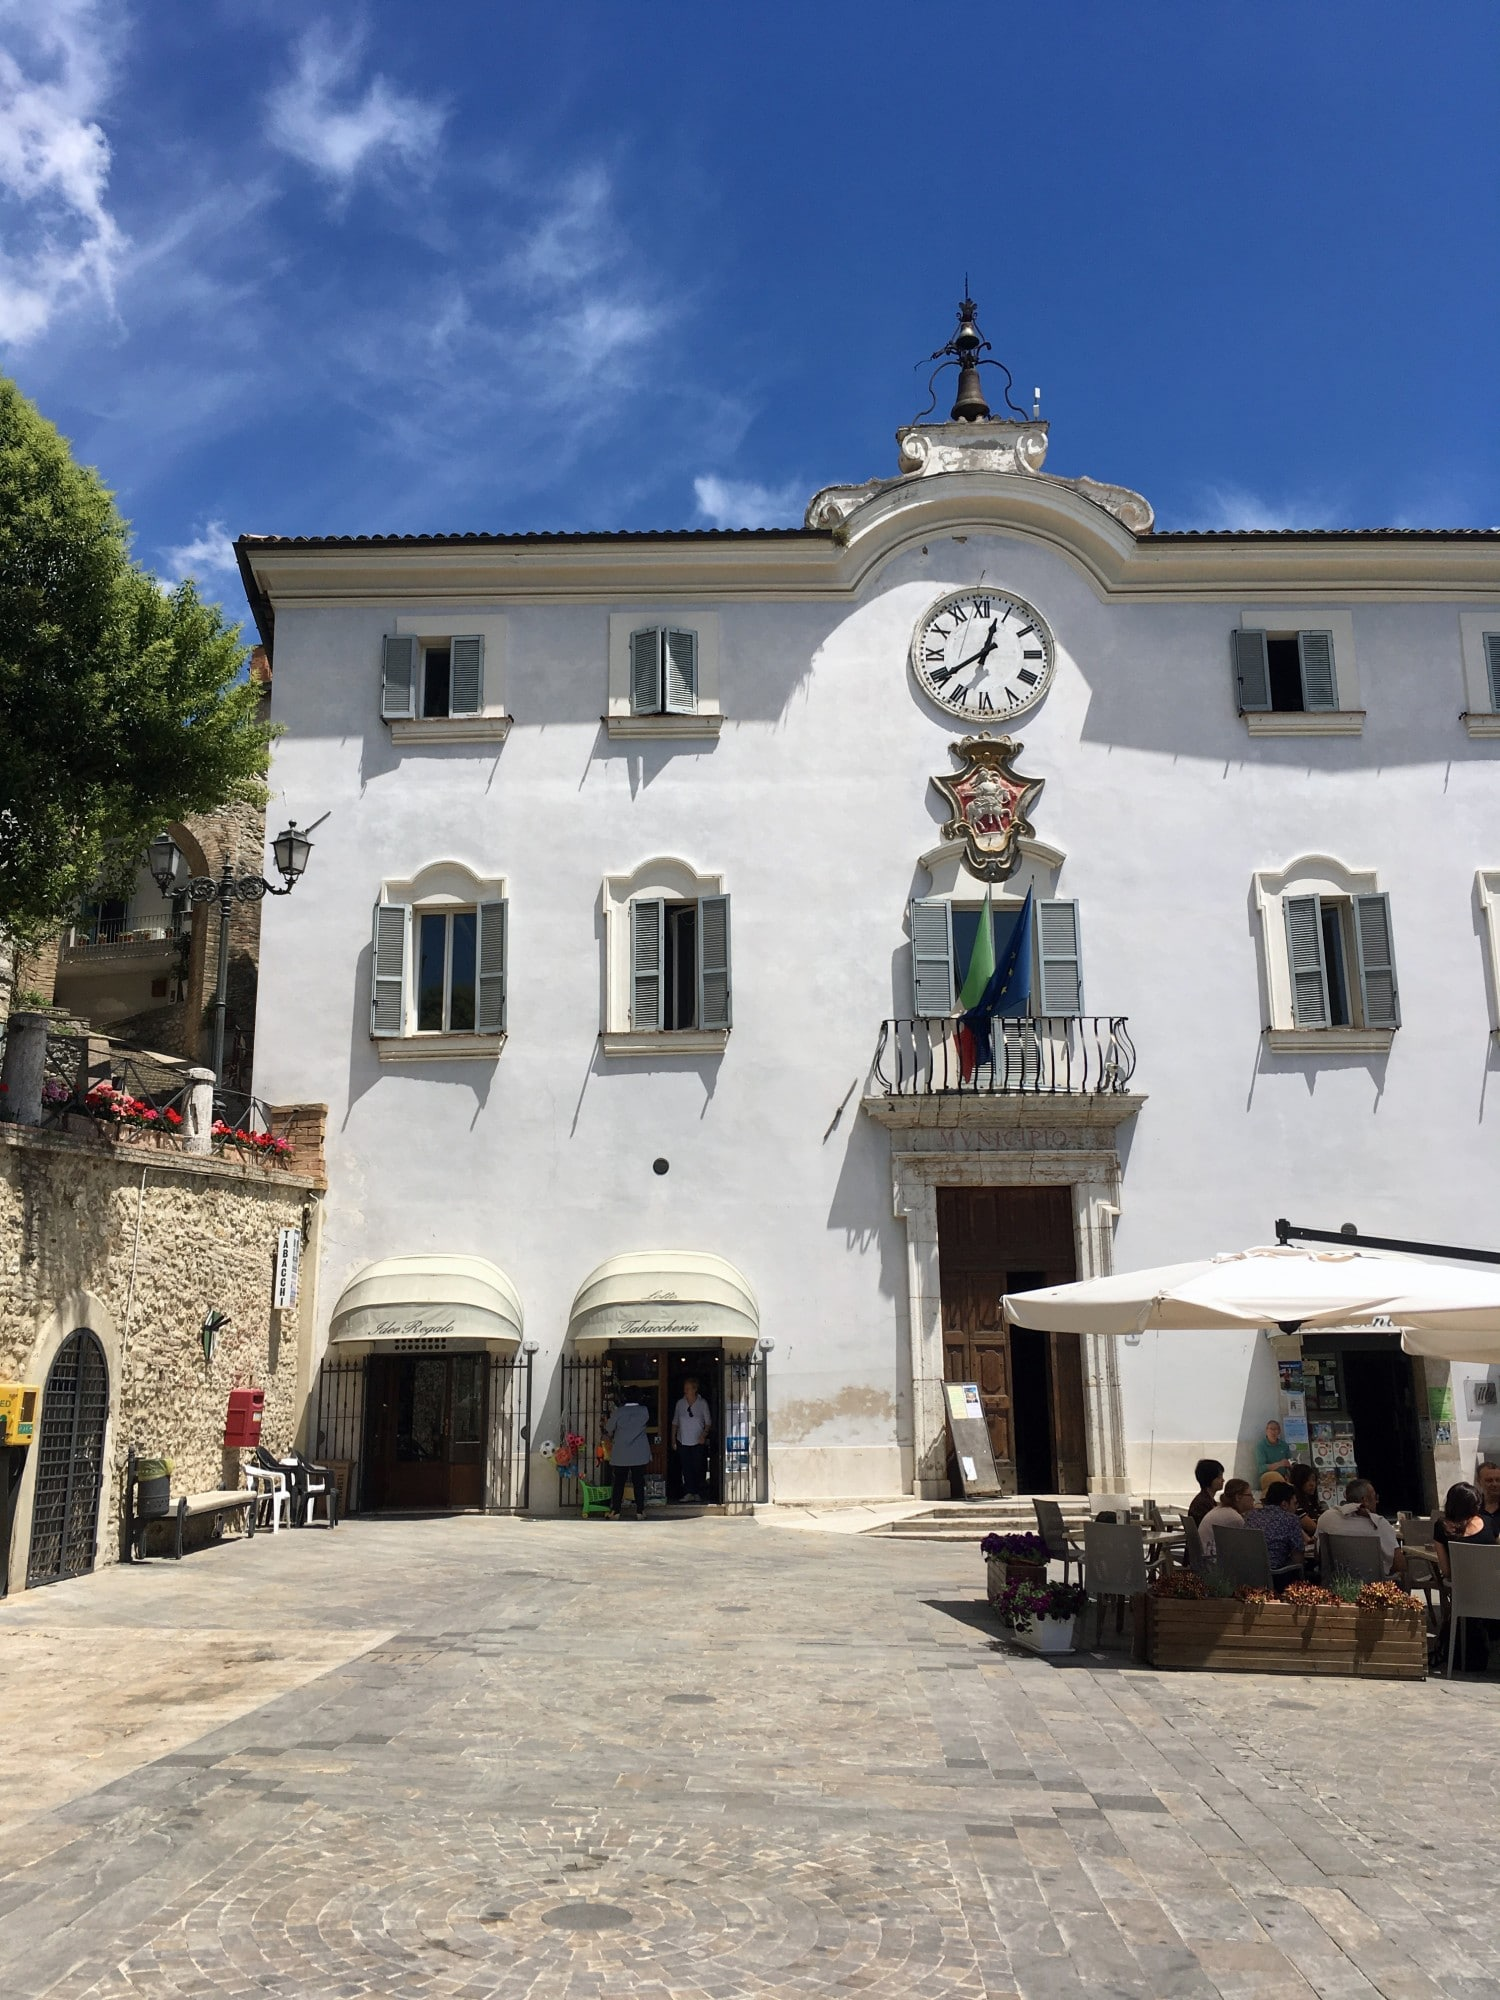 San Gemini Town Square